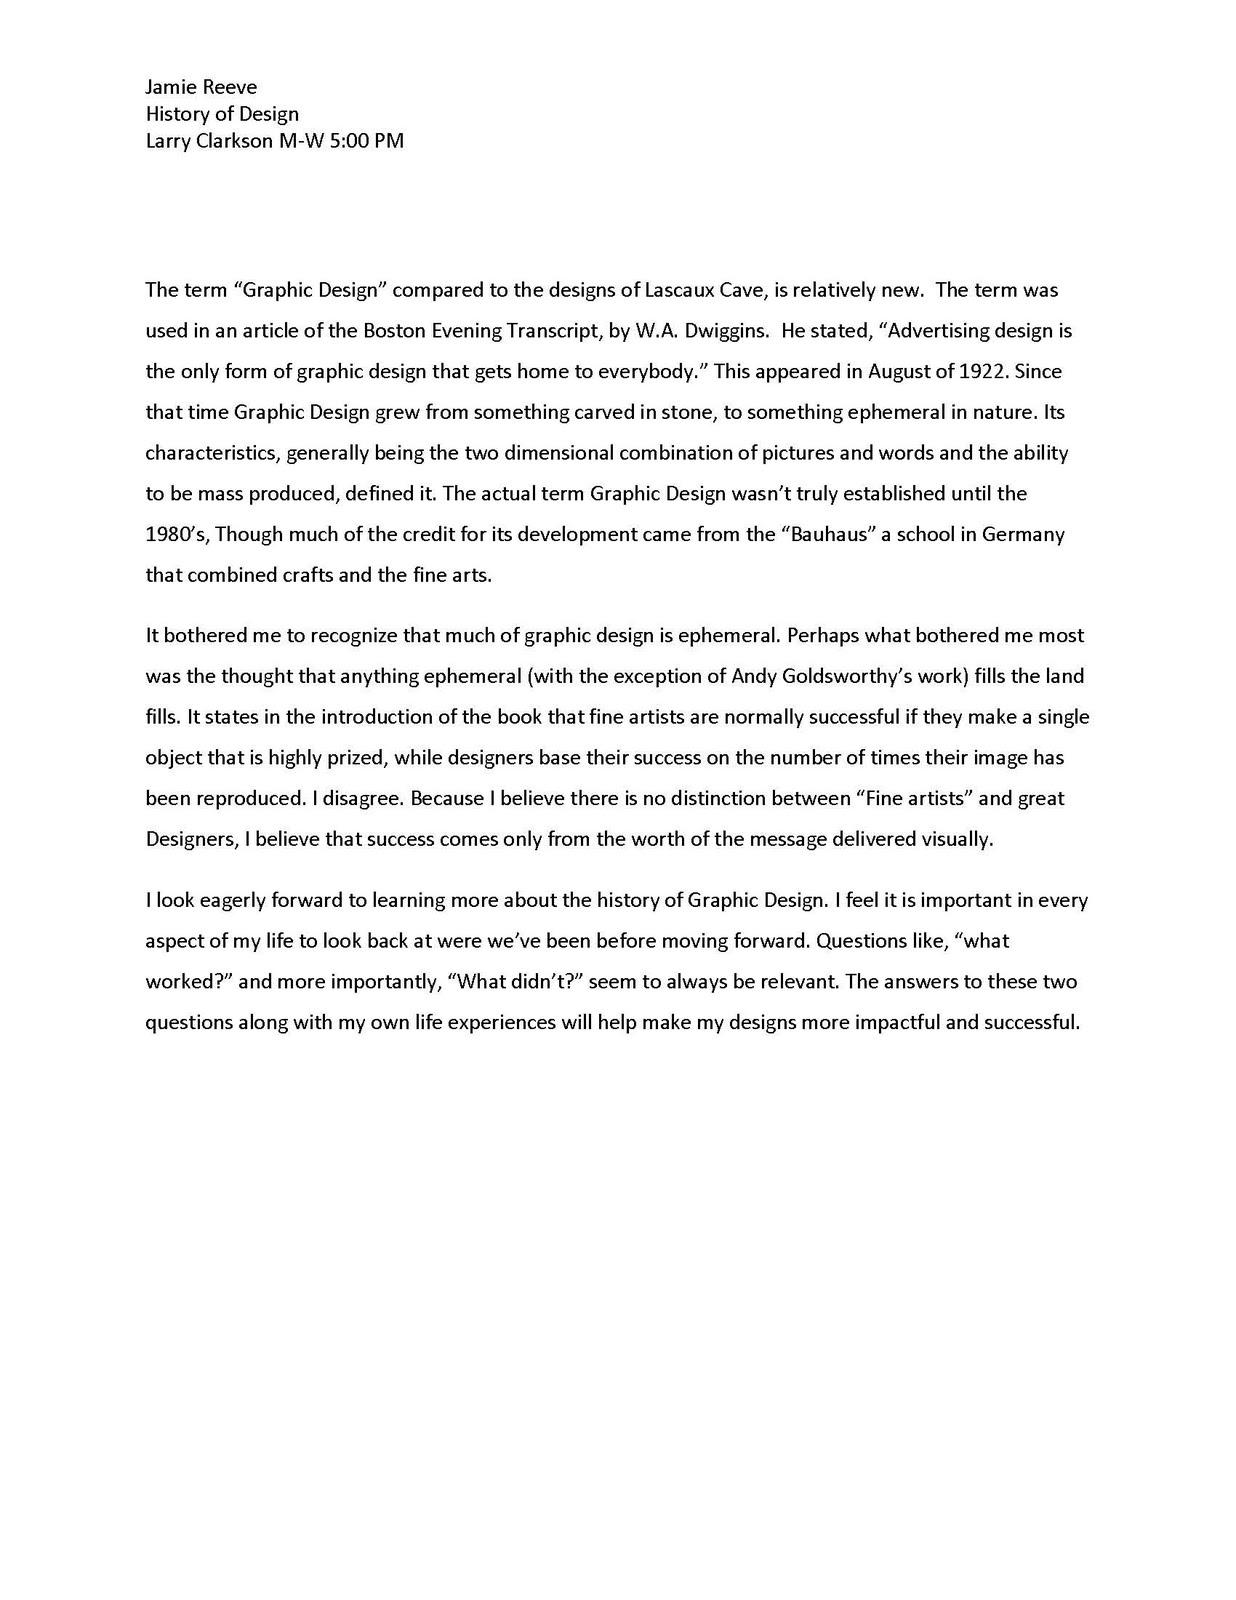 Explication essay